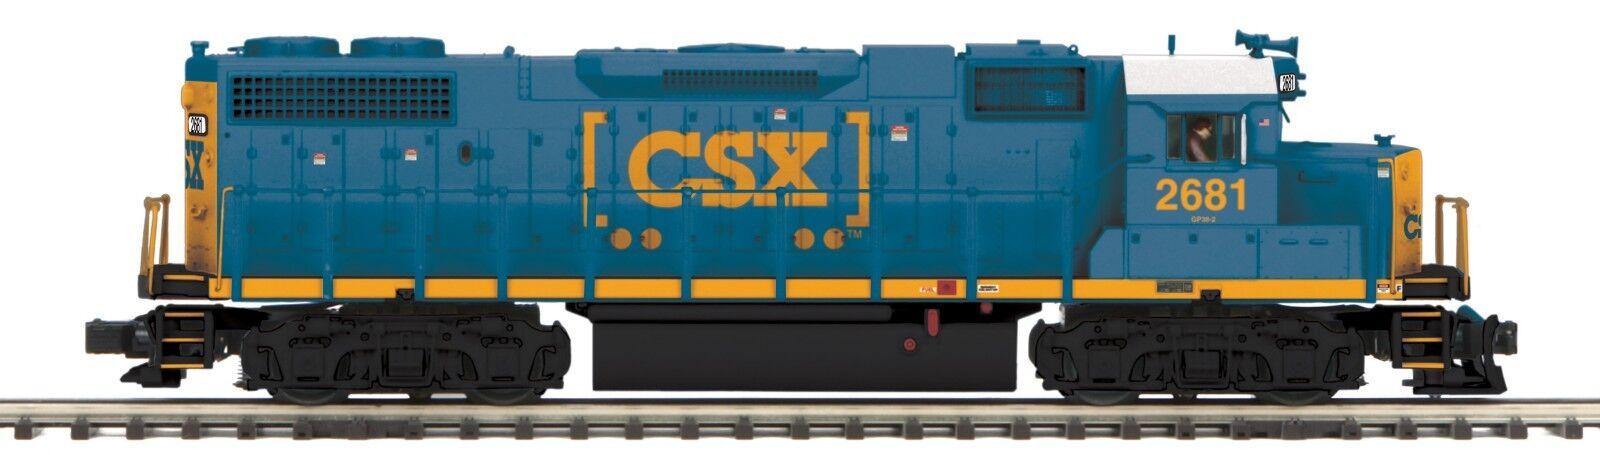 MTH 20-20905-1 20-20905-1 20-20905-1 O Scale Premier GP38-2 Diesel Engine With Predo-Sound 3.0 (Hi-Rai b79d50